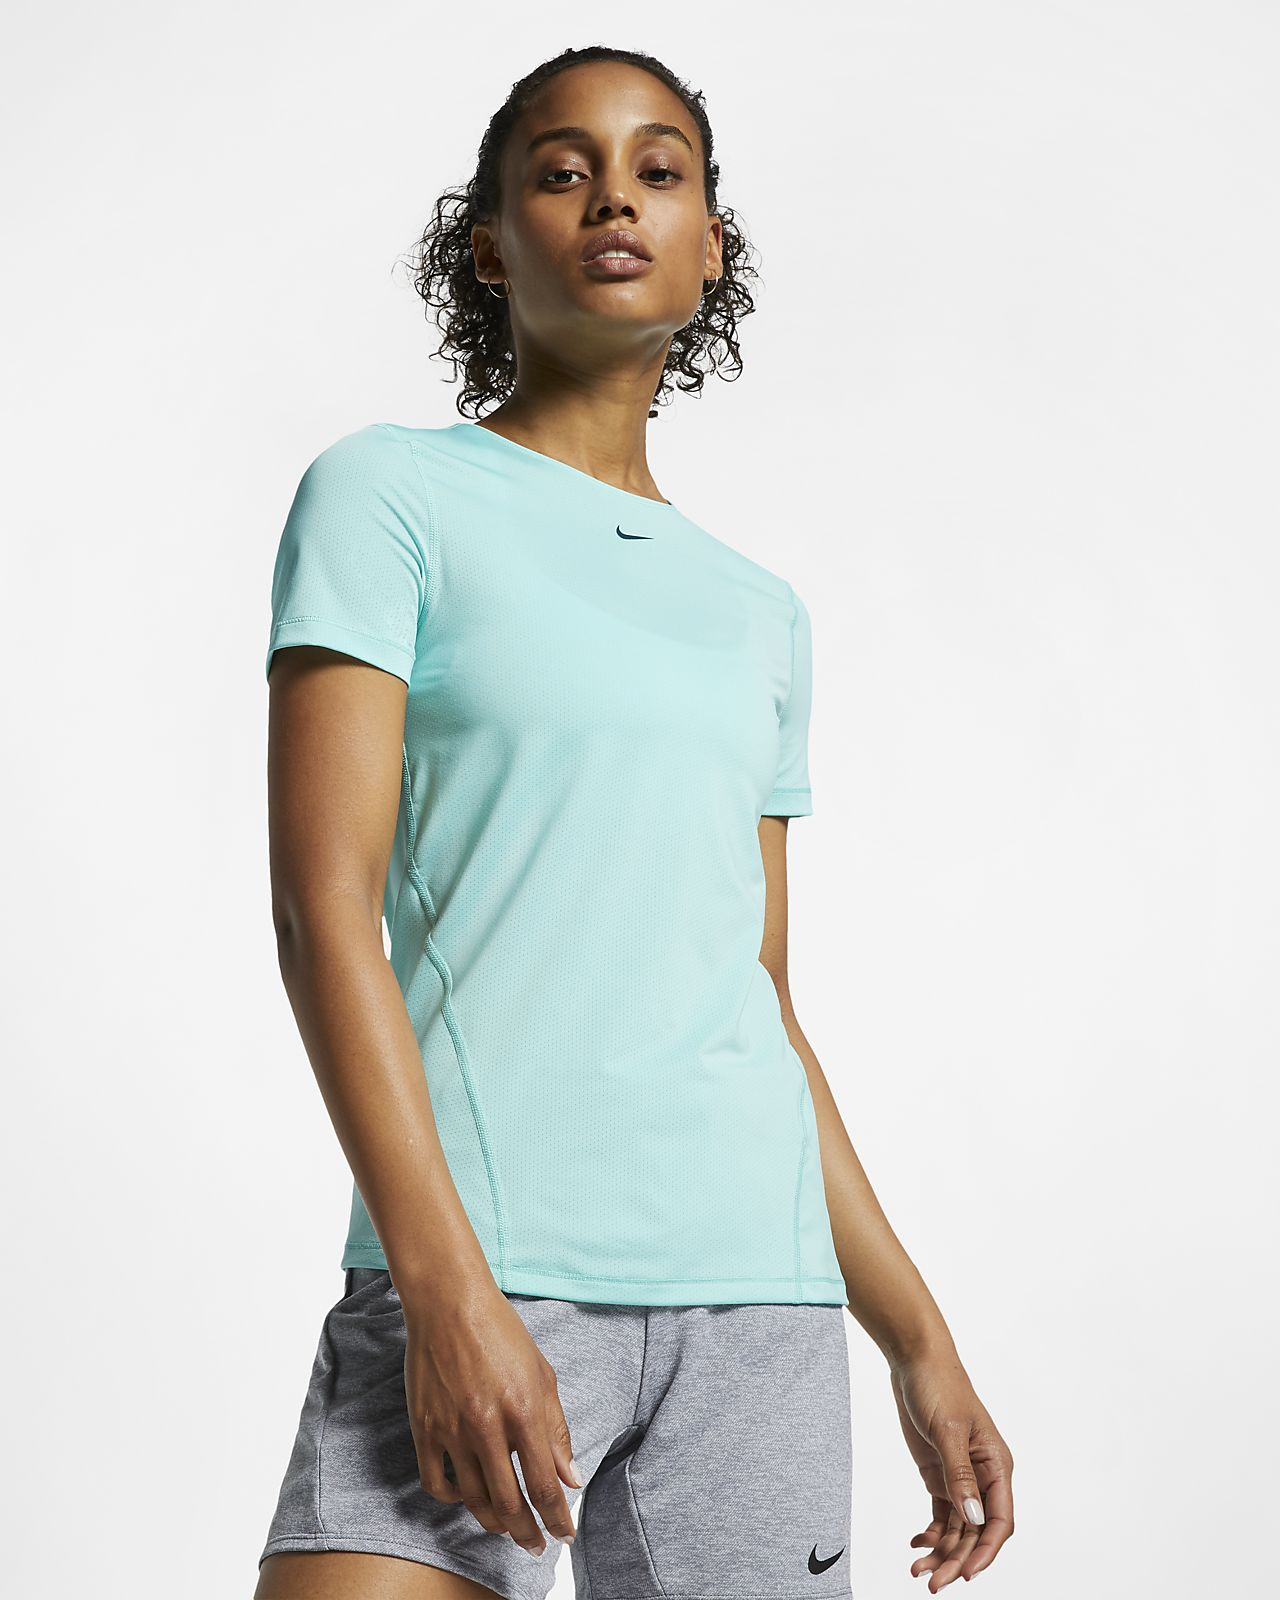 ce40d596a95c Nike Pro Women s Short-Sleeve Mesh Training Top. Nike.com IE